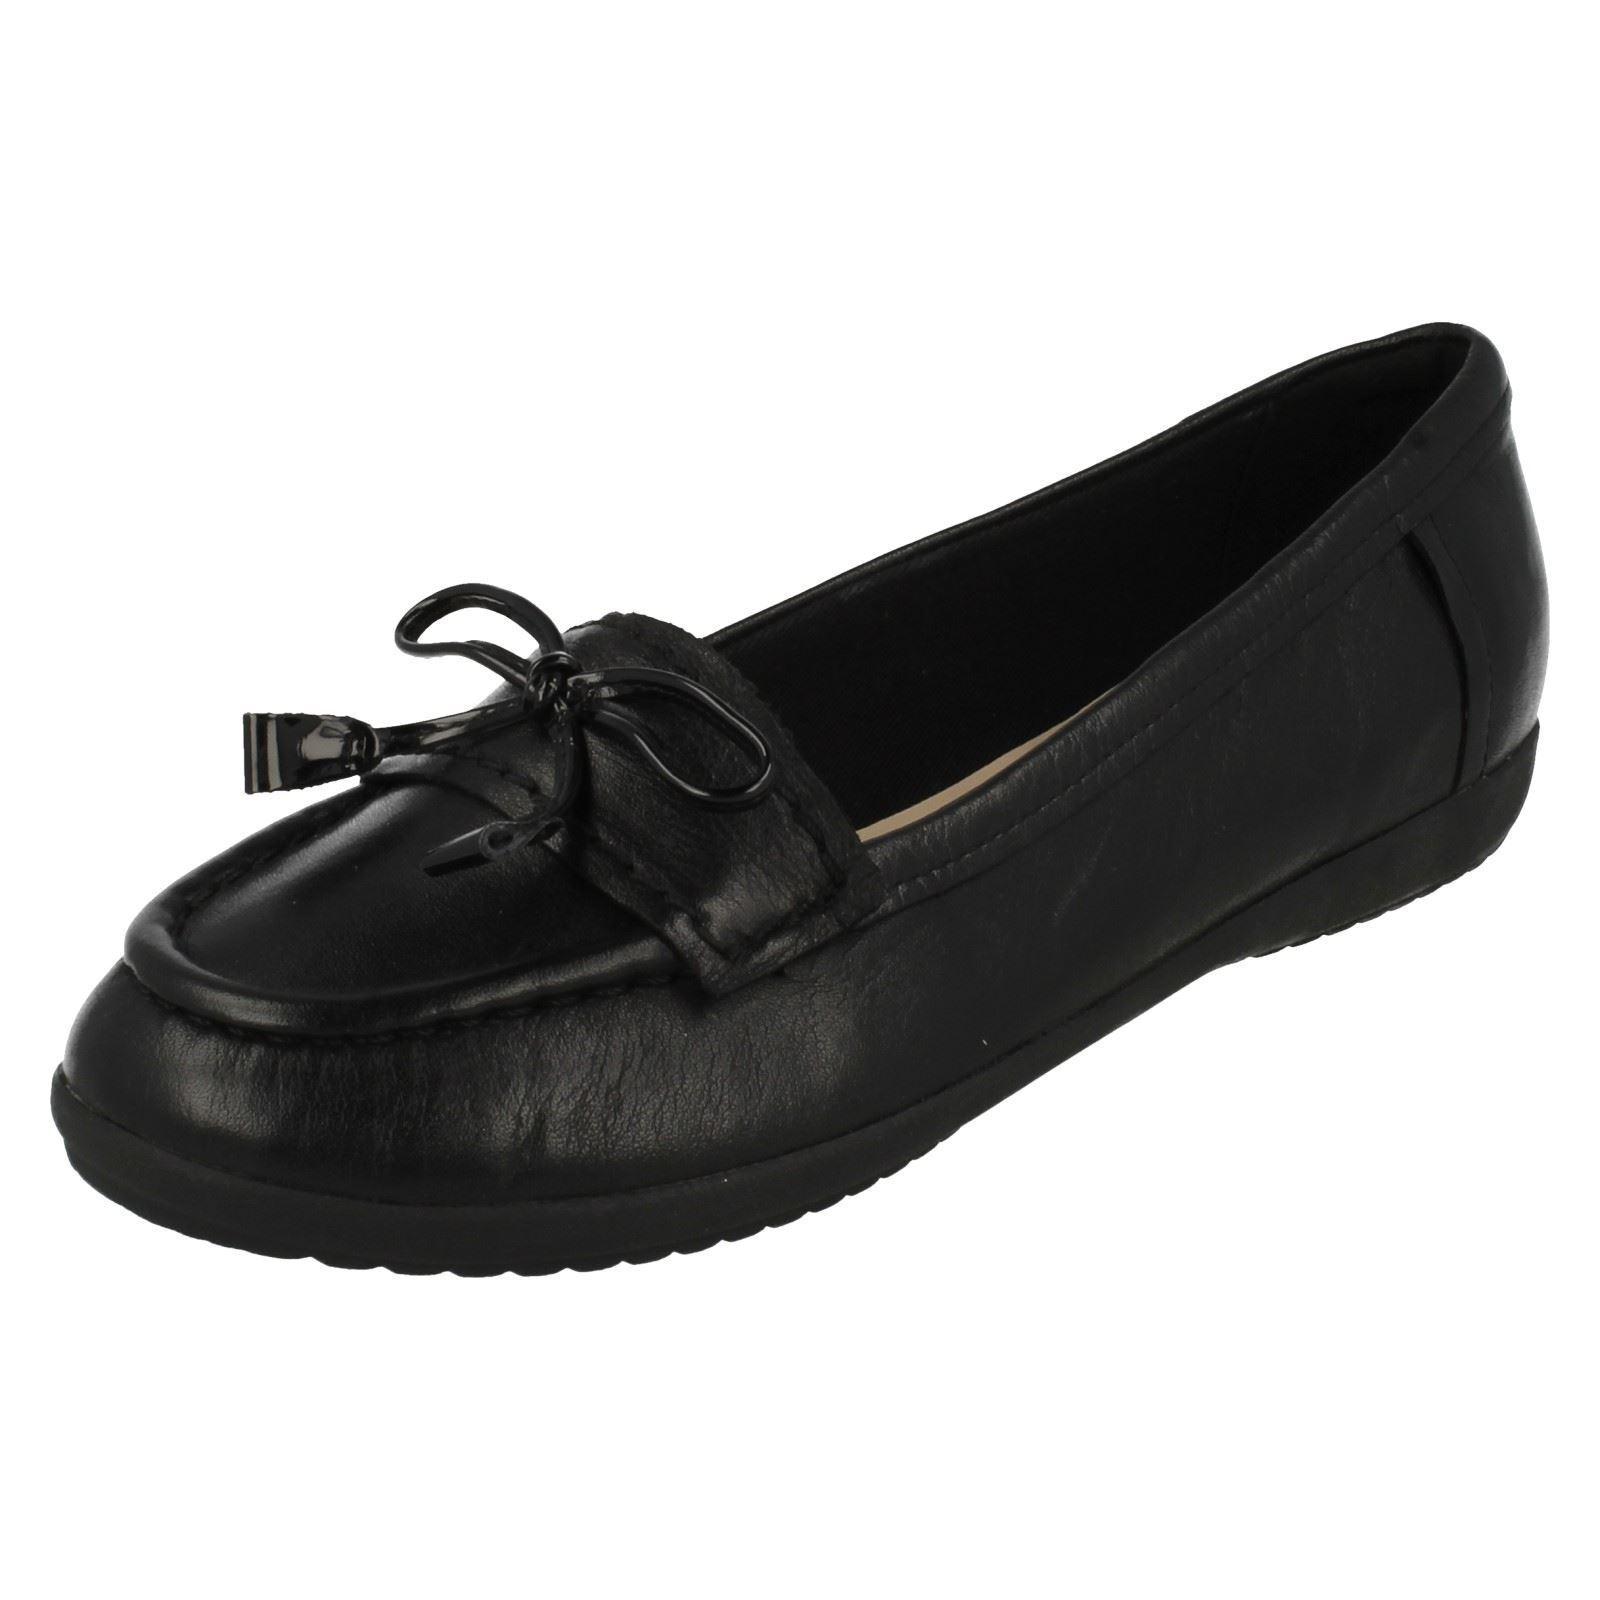 vendita online Signore Clarks Clarks Clarks FEYA Bloom Mocassino Stile Scarpe Piatte  vendita online risparmia il 70%